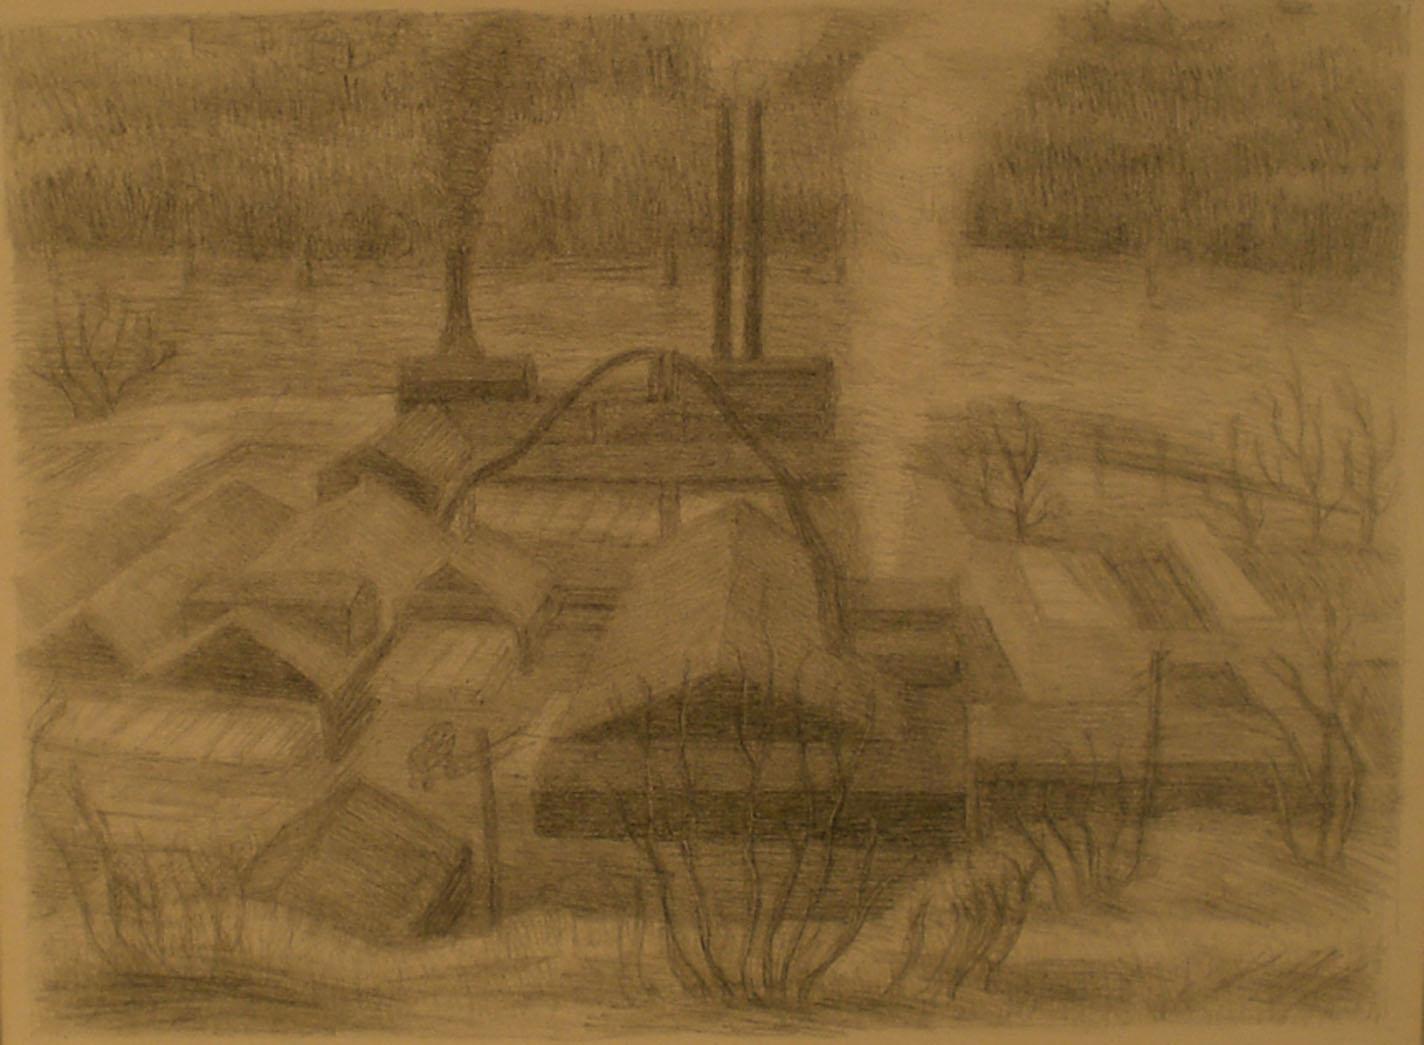 Saw Mill , print, 18 ¼ x 15 ¾  Pathways Original Print Collection